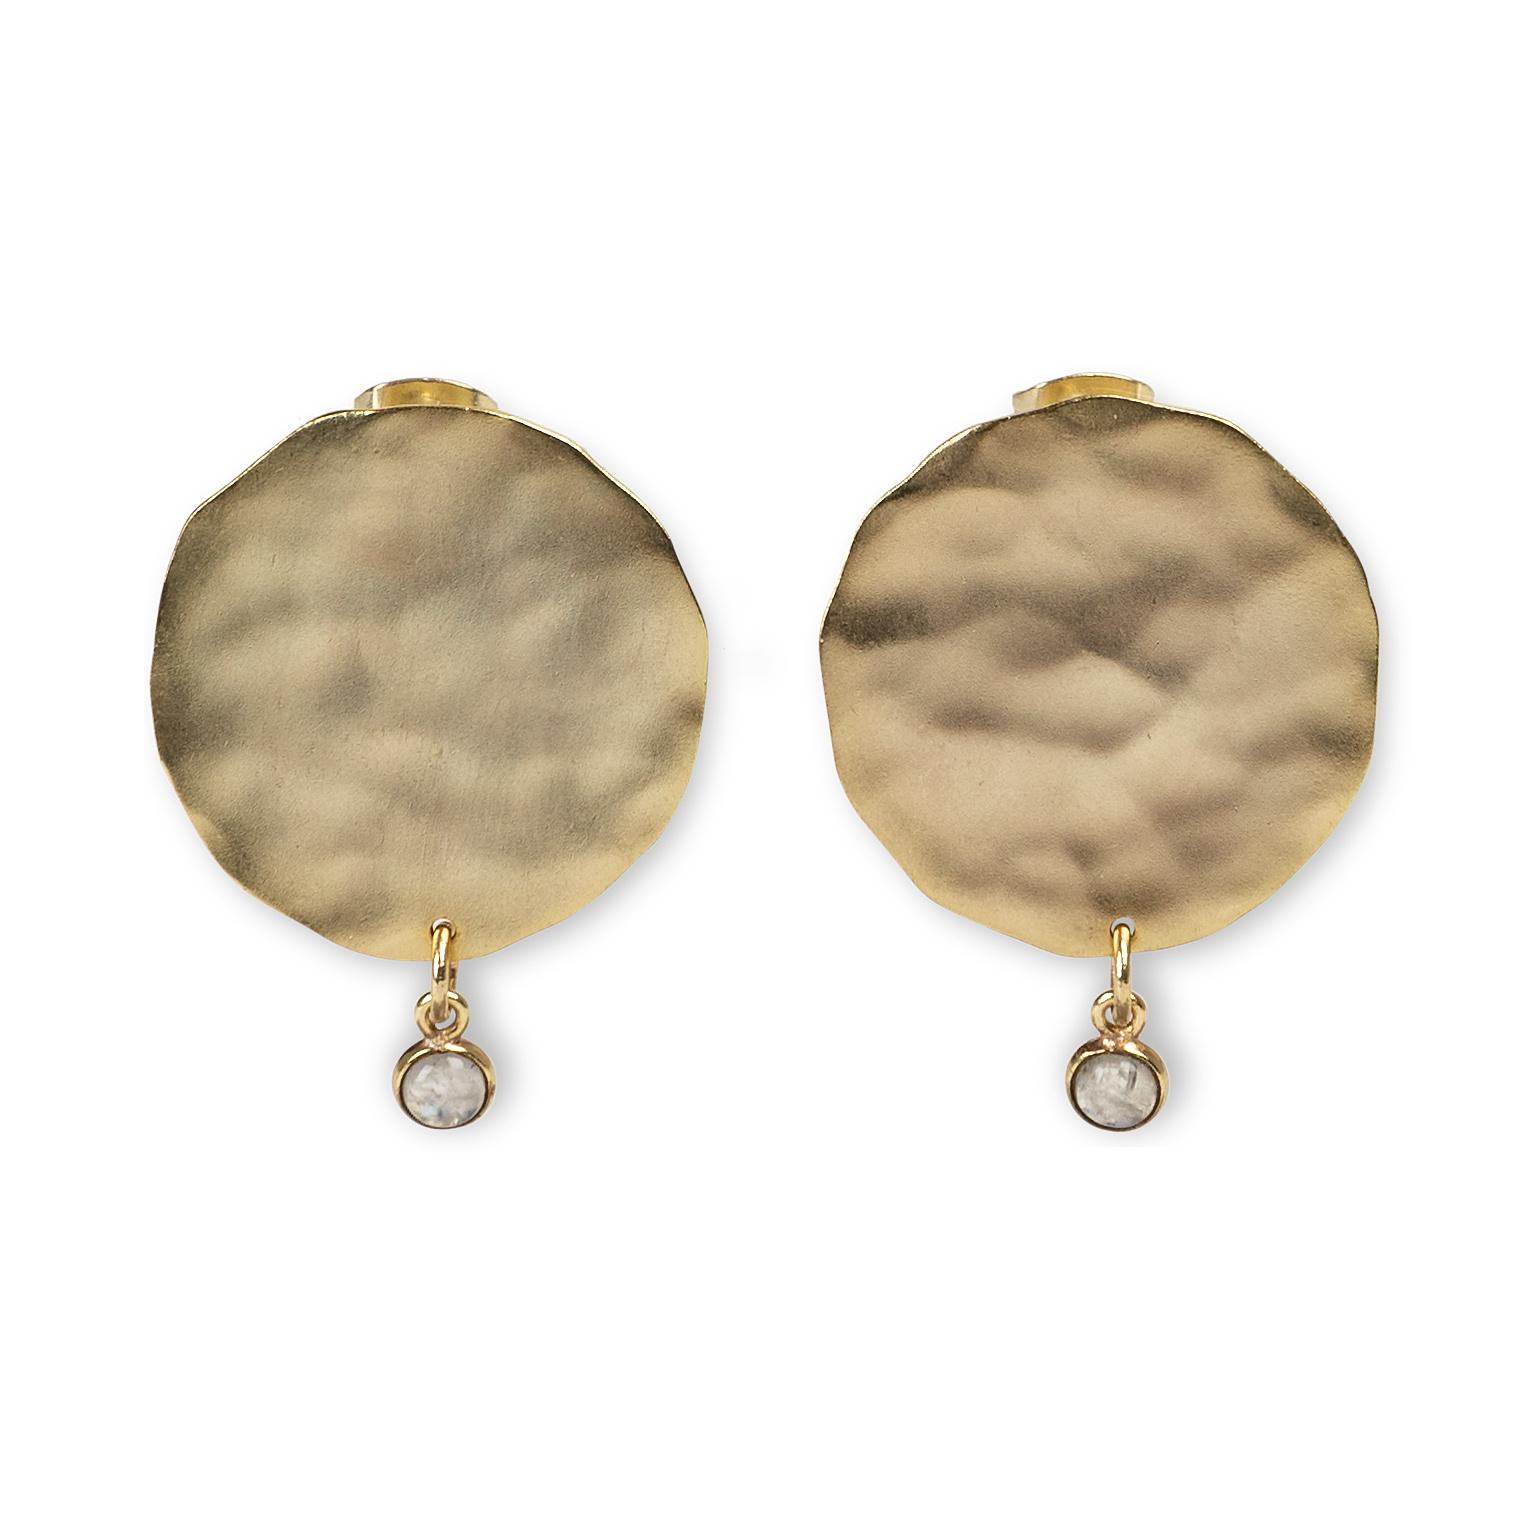 yaya Earrings with coin a 133387-014-1